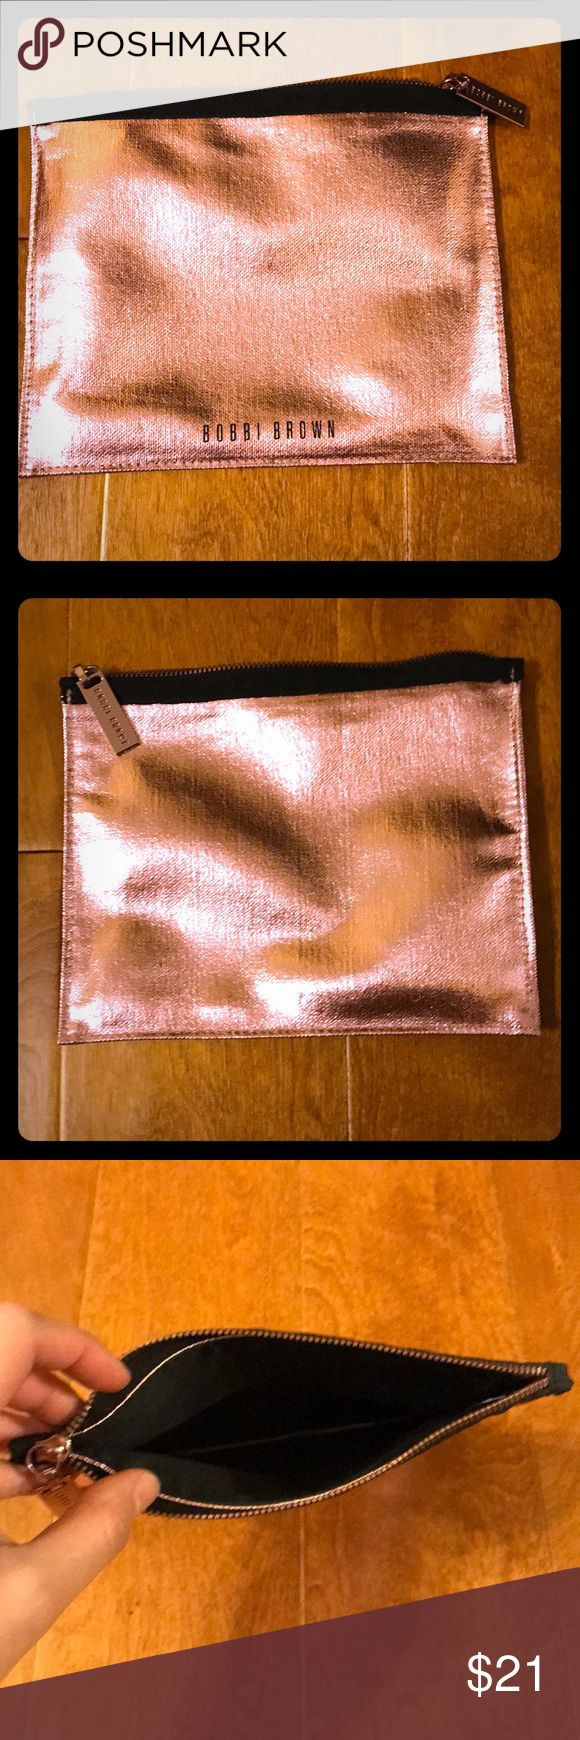 New Bobbi Brown Makeup Bag New pink Bobbi Brown makeup bag. Bobbi Brown Makeup Brushes & Tools